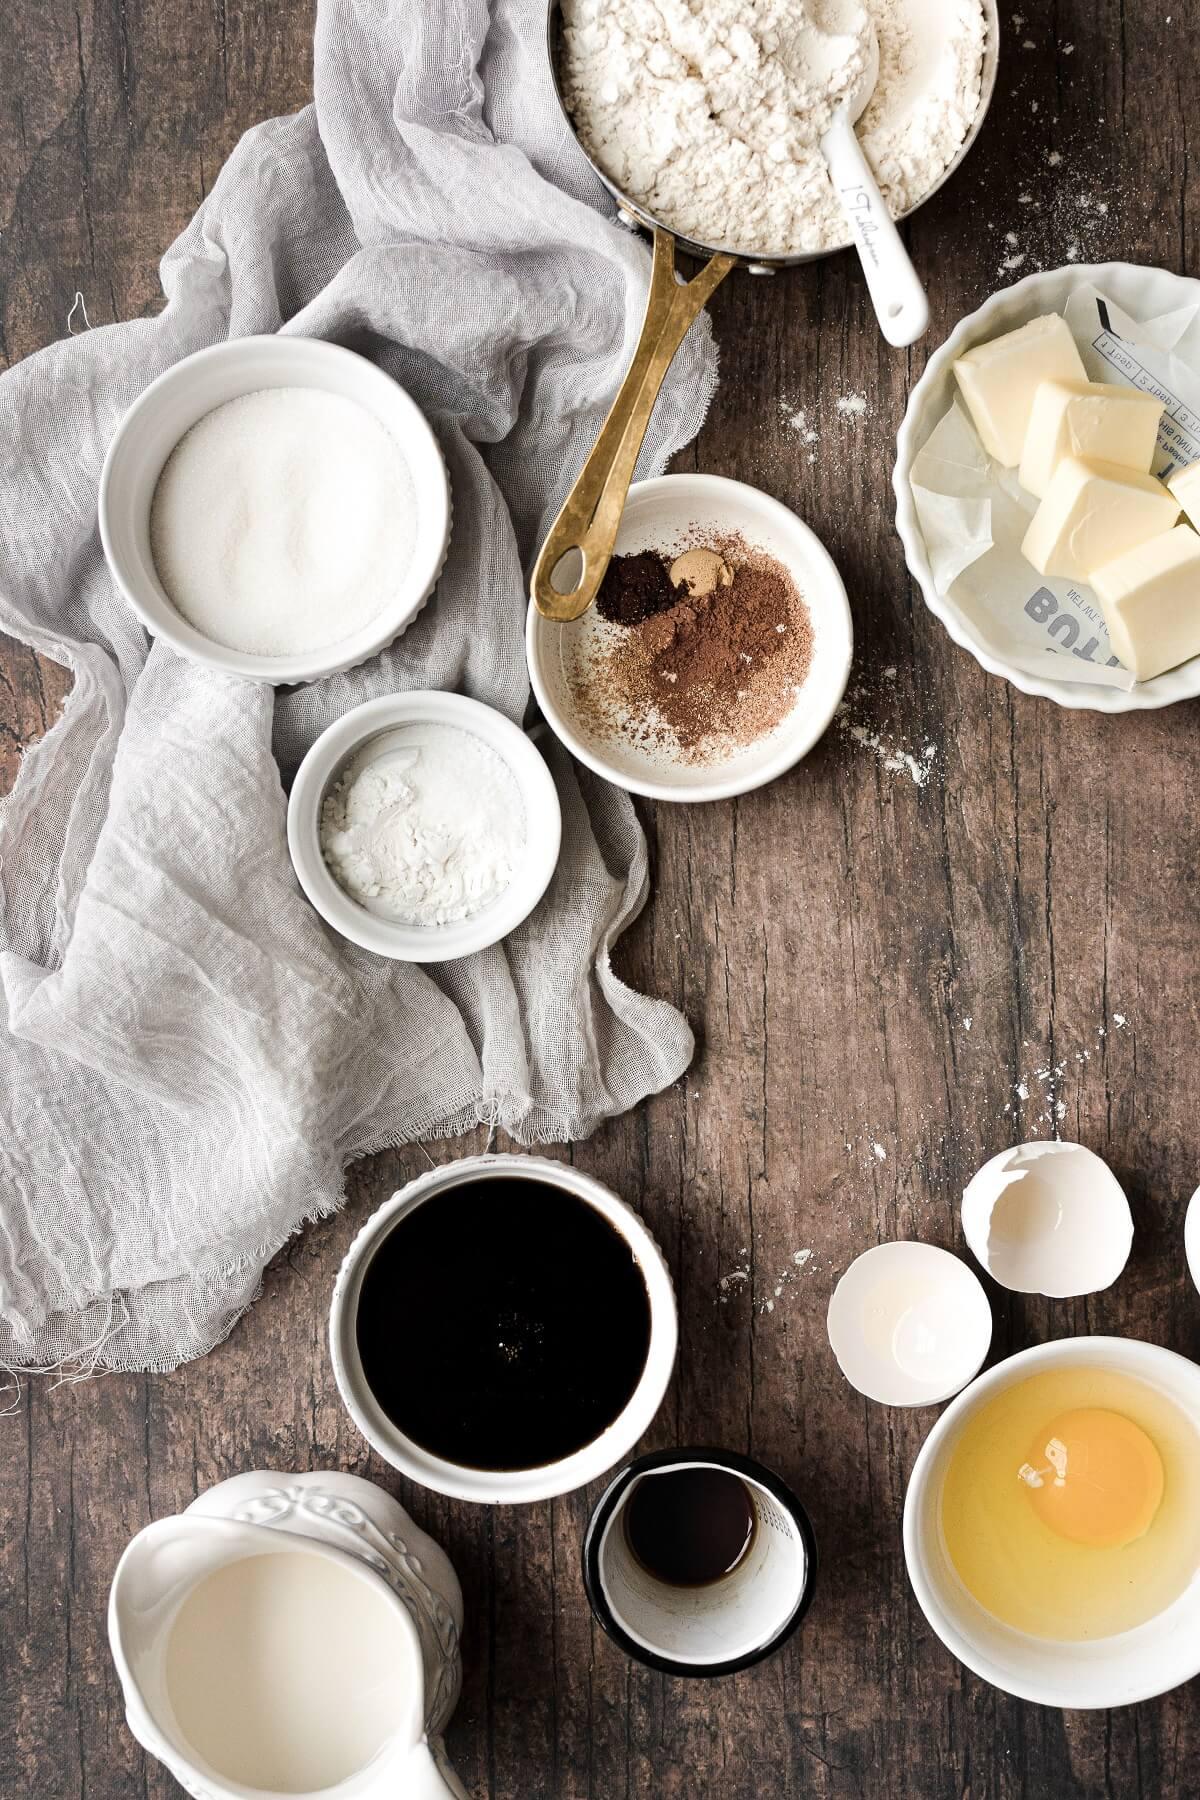 Ingredients for making apple cider pancakes.